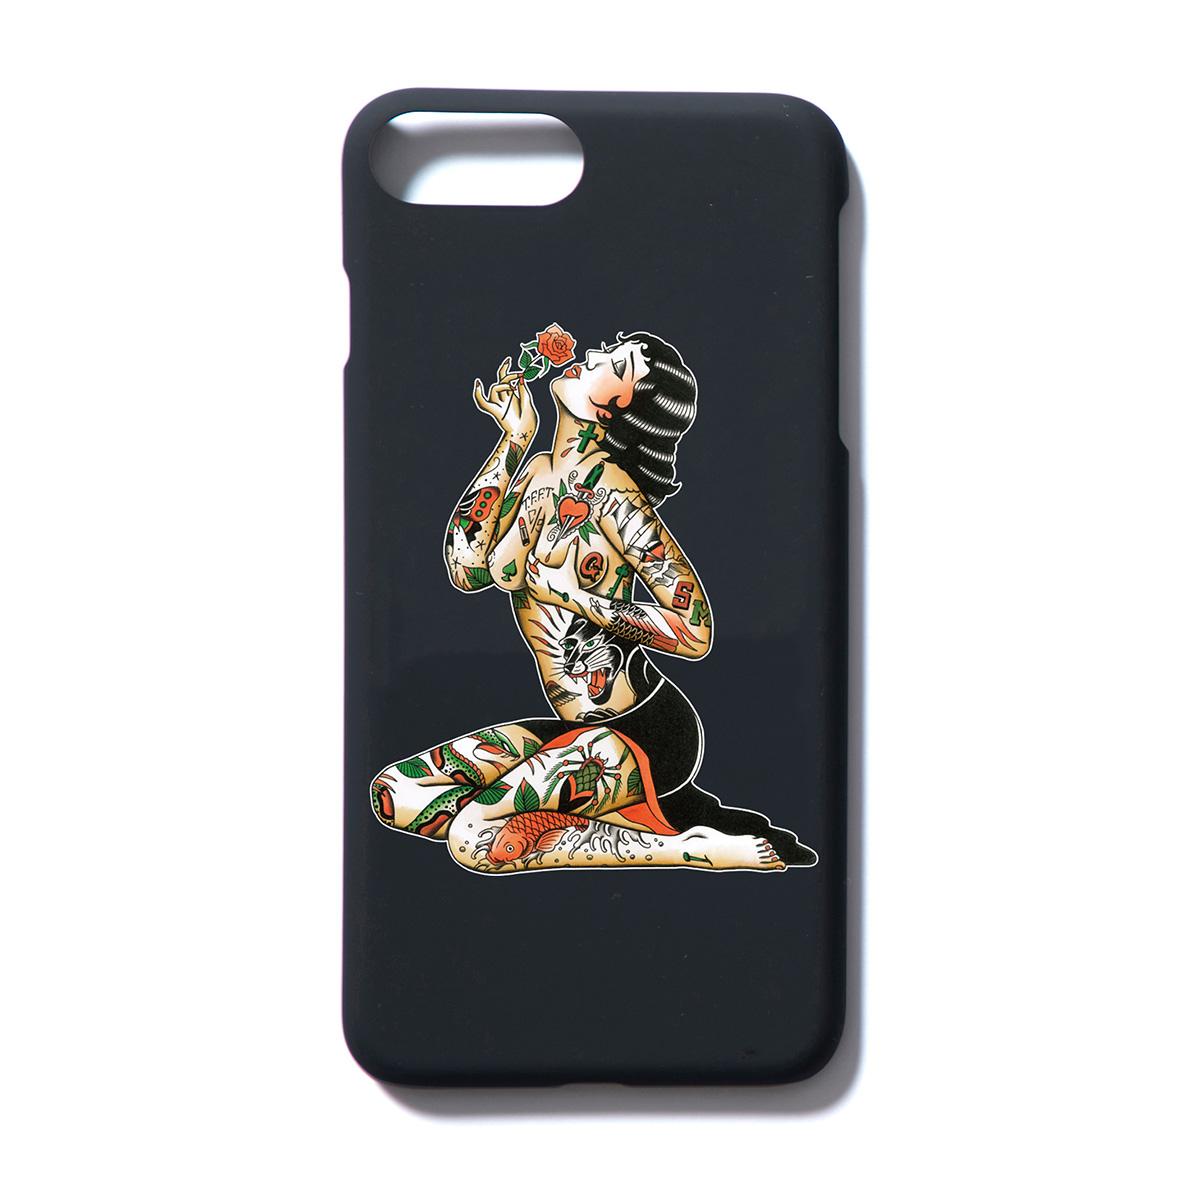 VARGAS iPhone CASE